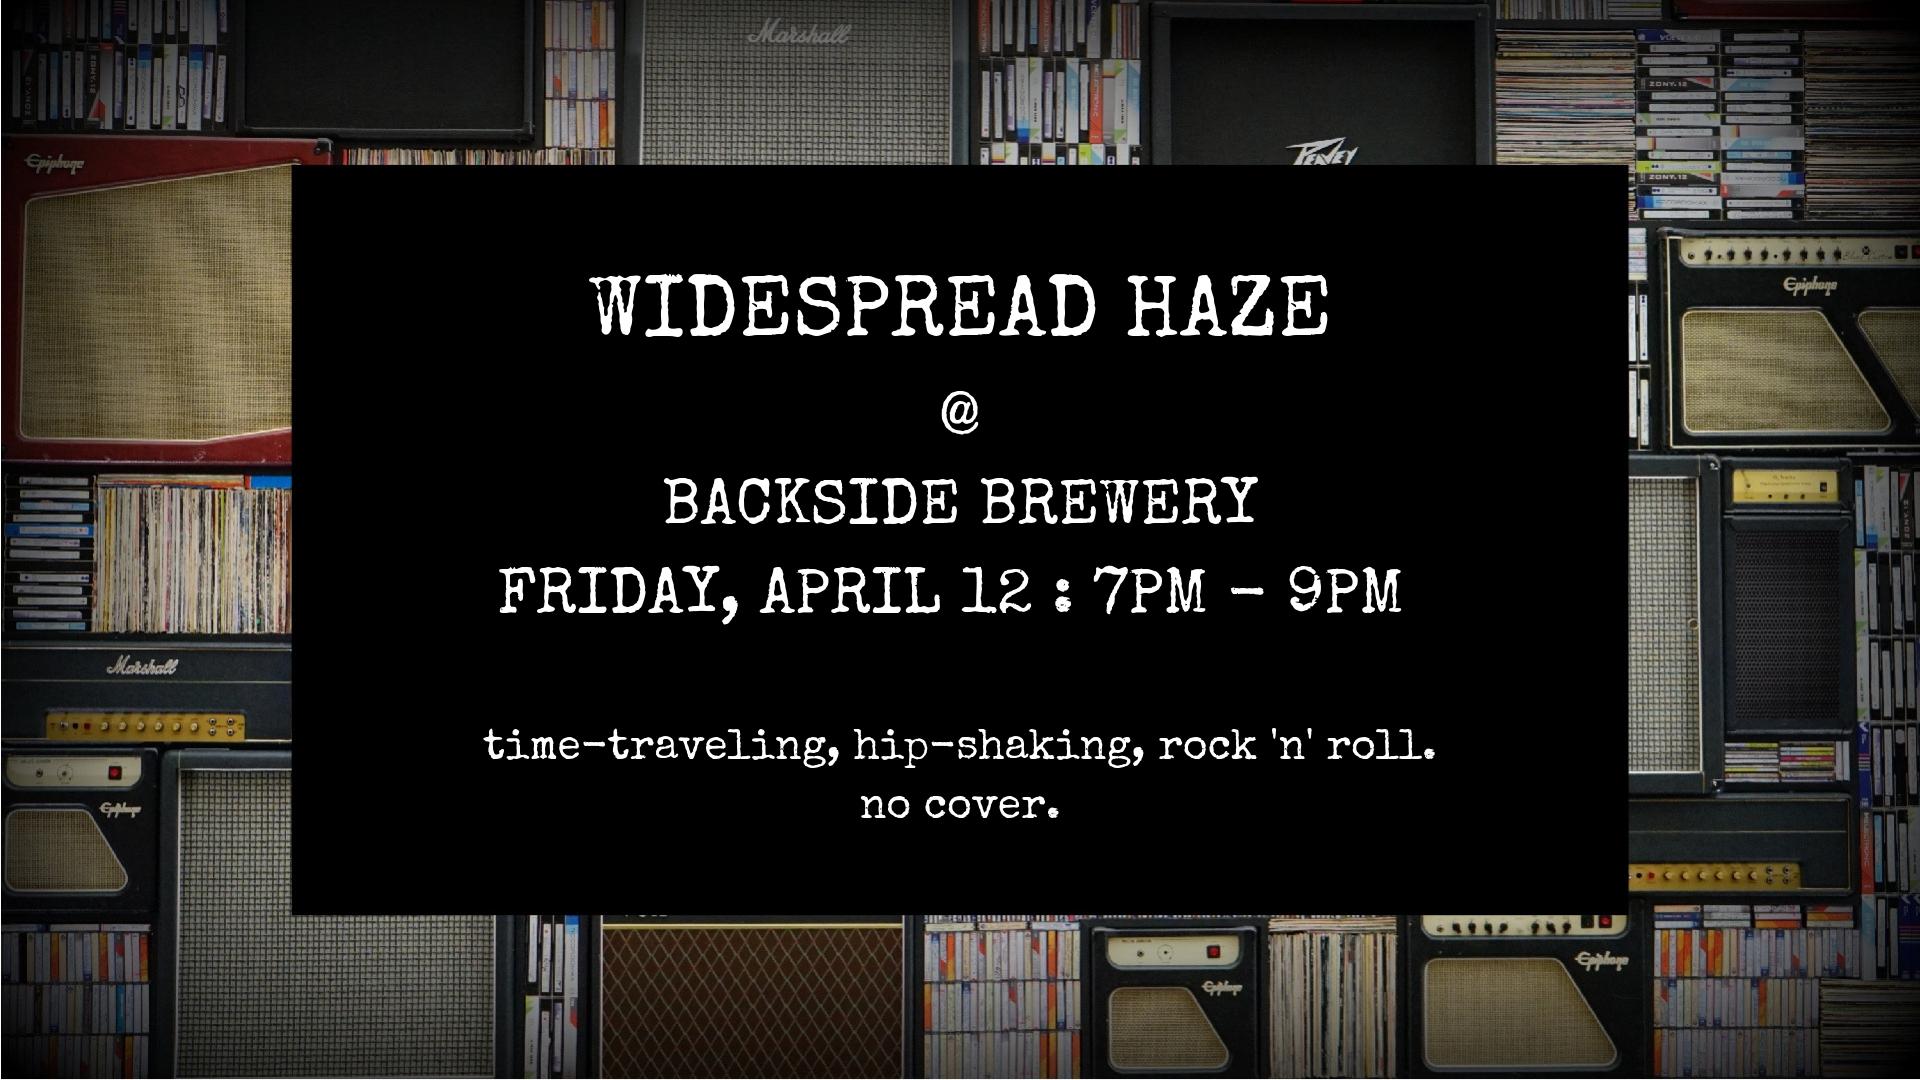 WIDESPREAD HAZE_backside brewery.jpg